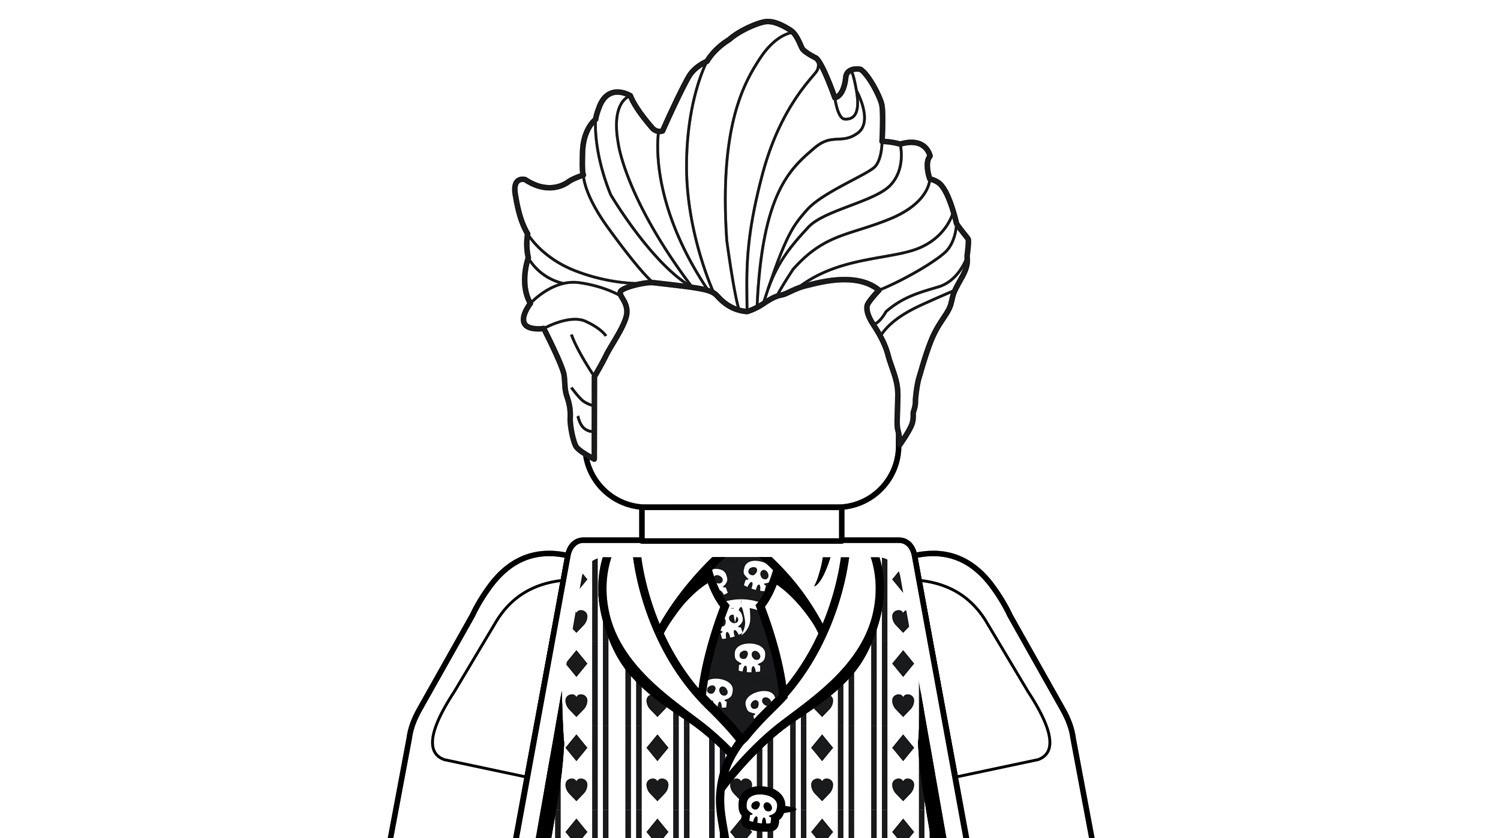 Ausmalbilder Lego Batman Das Beste Von Lego Batman Coloring Coloring Pages Pinterest Frisch Batman Joker Bilder